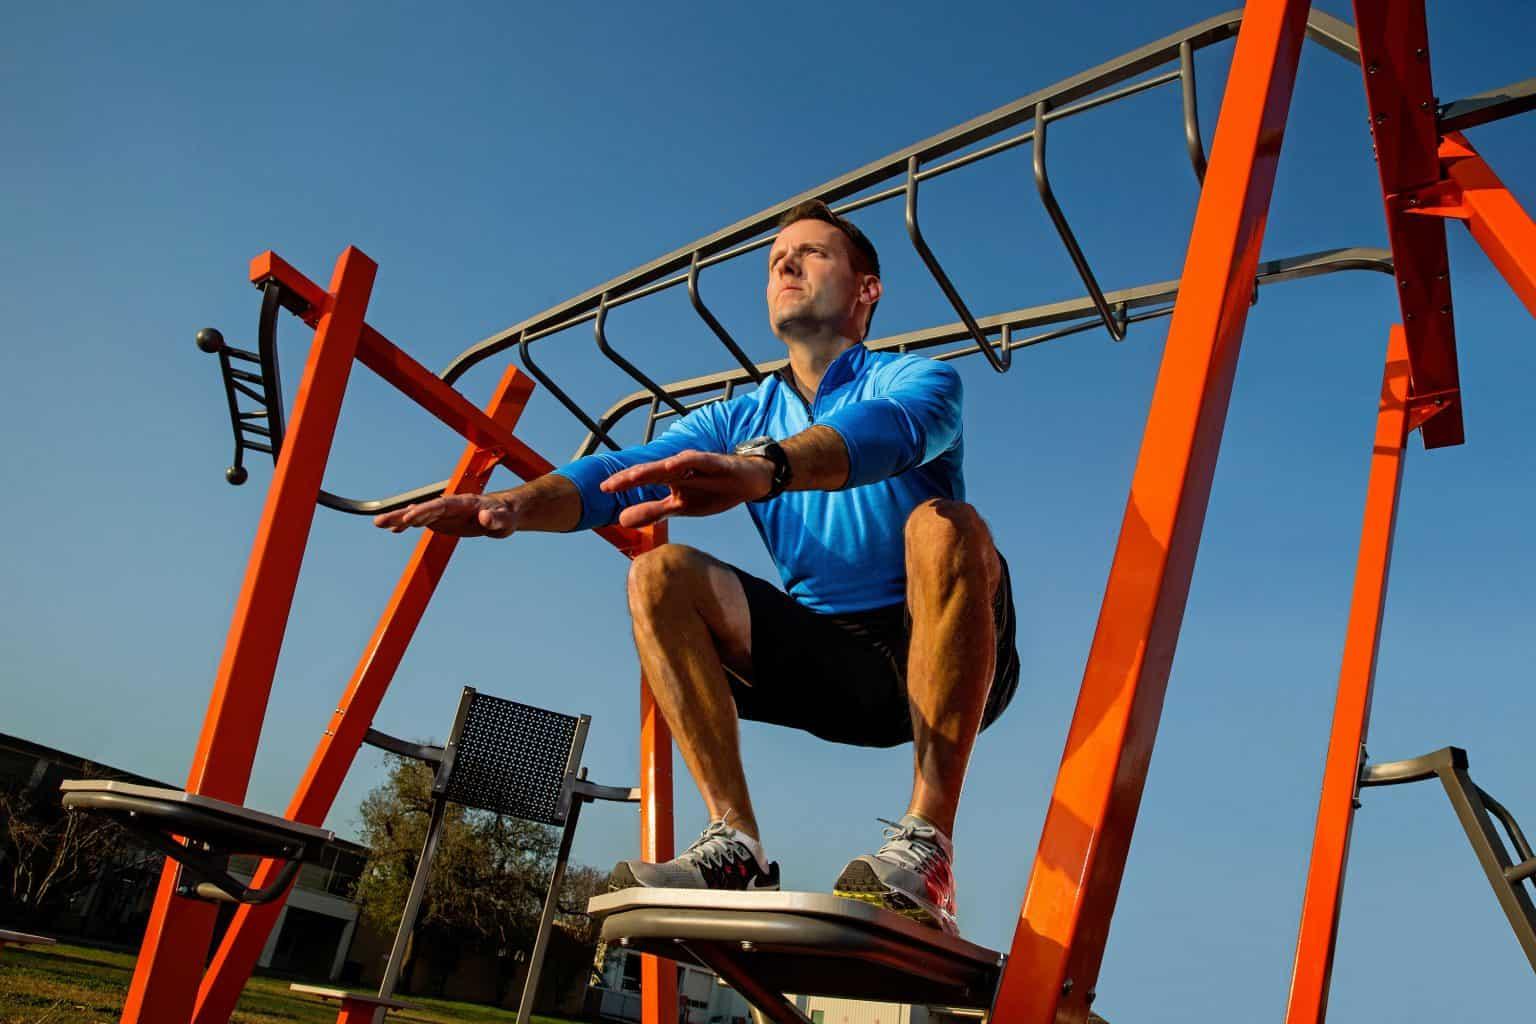 outdoor-fitness-equipment_49644067852_o-1536x1024